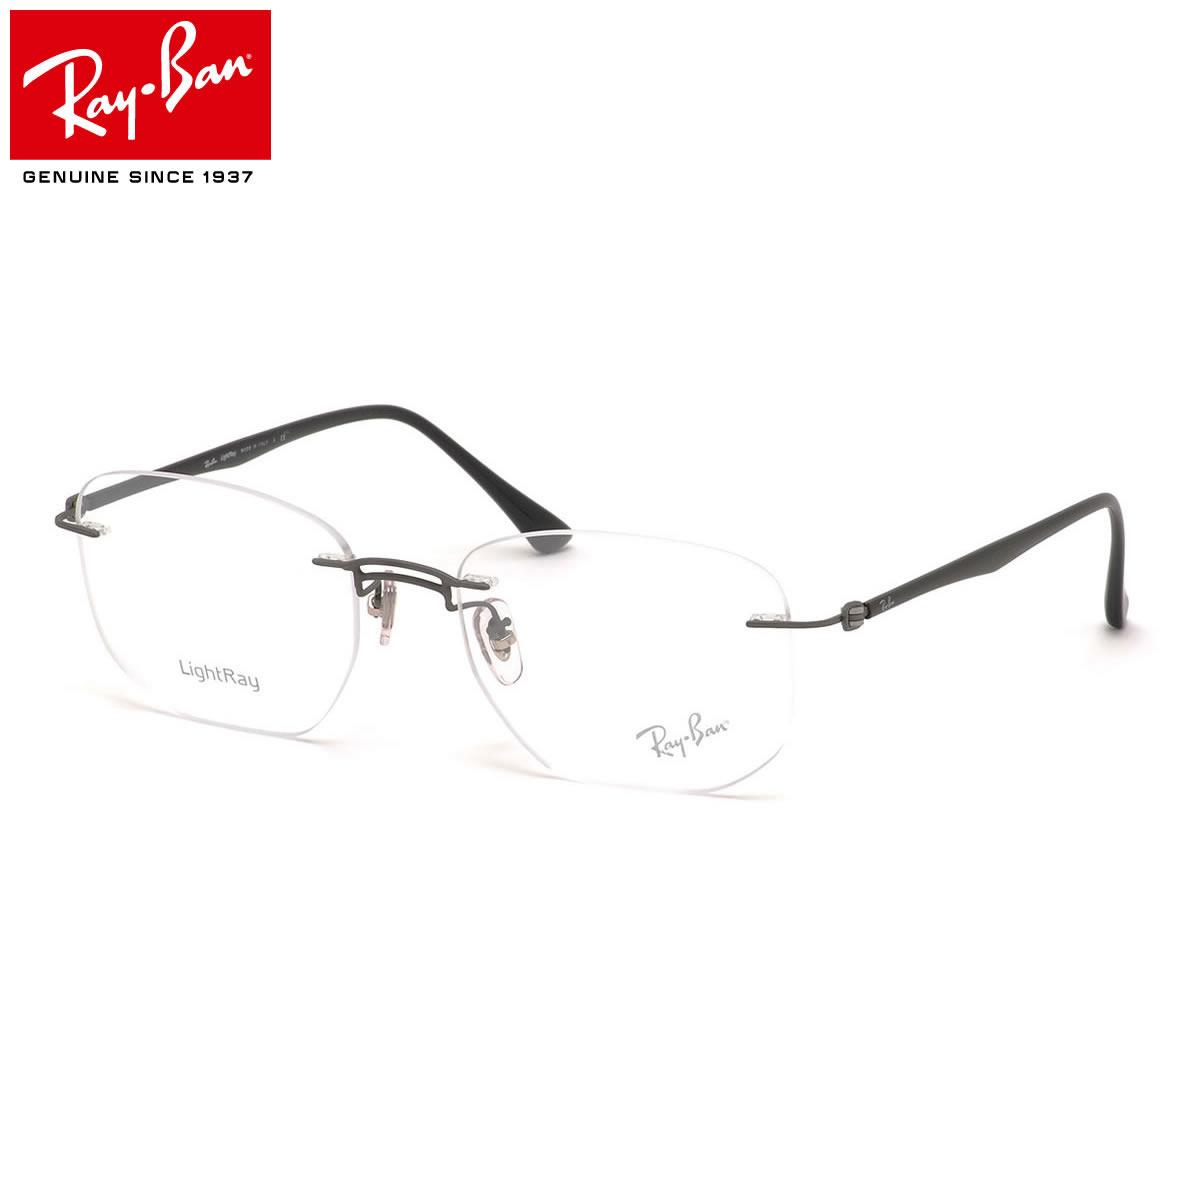 Ray-Ban レイバン メガネ RX8757 1128 53サイズ Ray-Ban LightRay ツーポイントフレーム リムレスフレーム 縁なしフレーム ウェリントン メンズ レディース